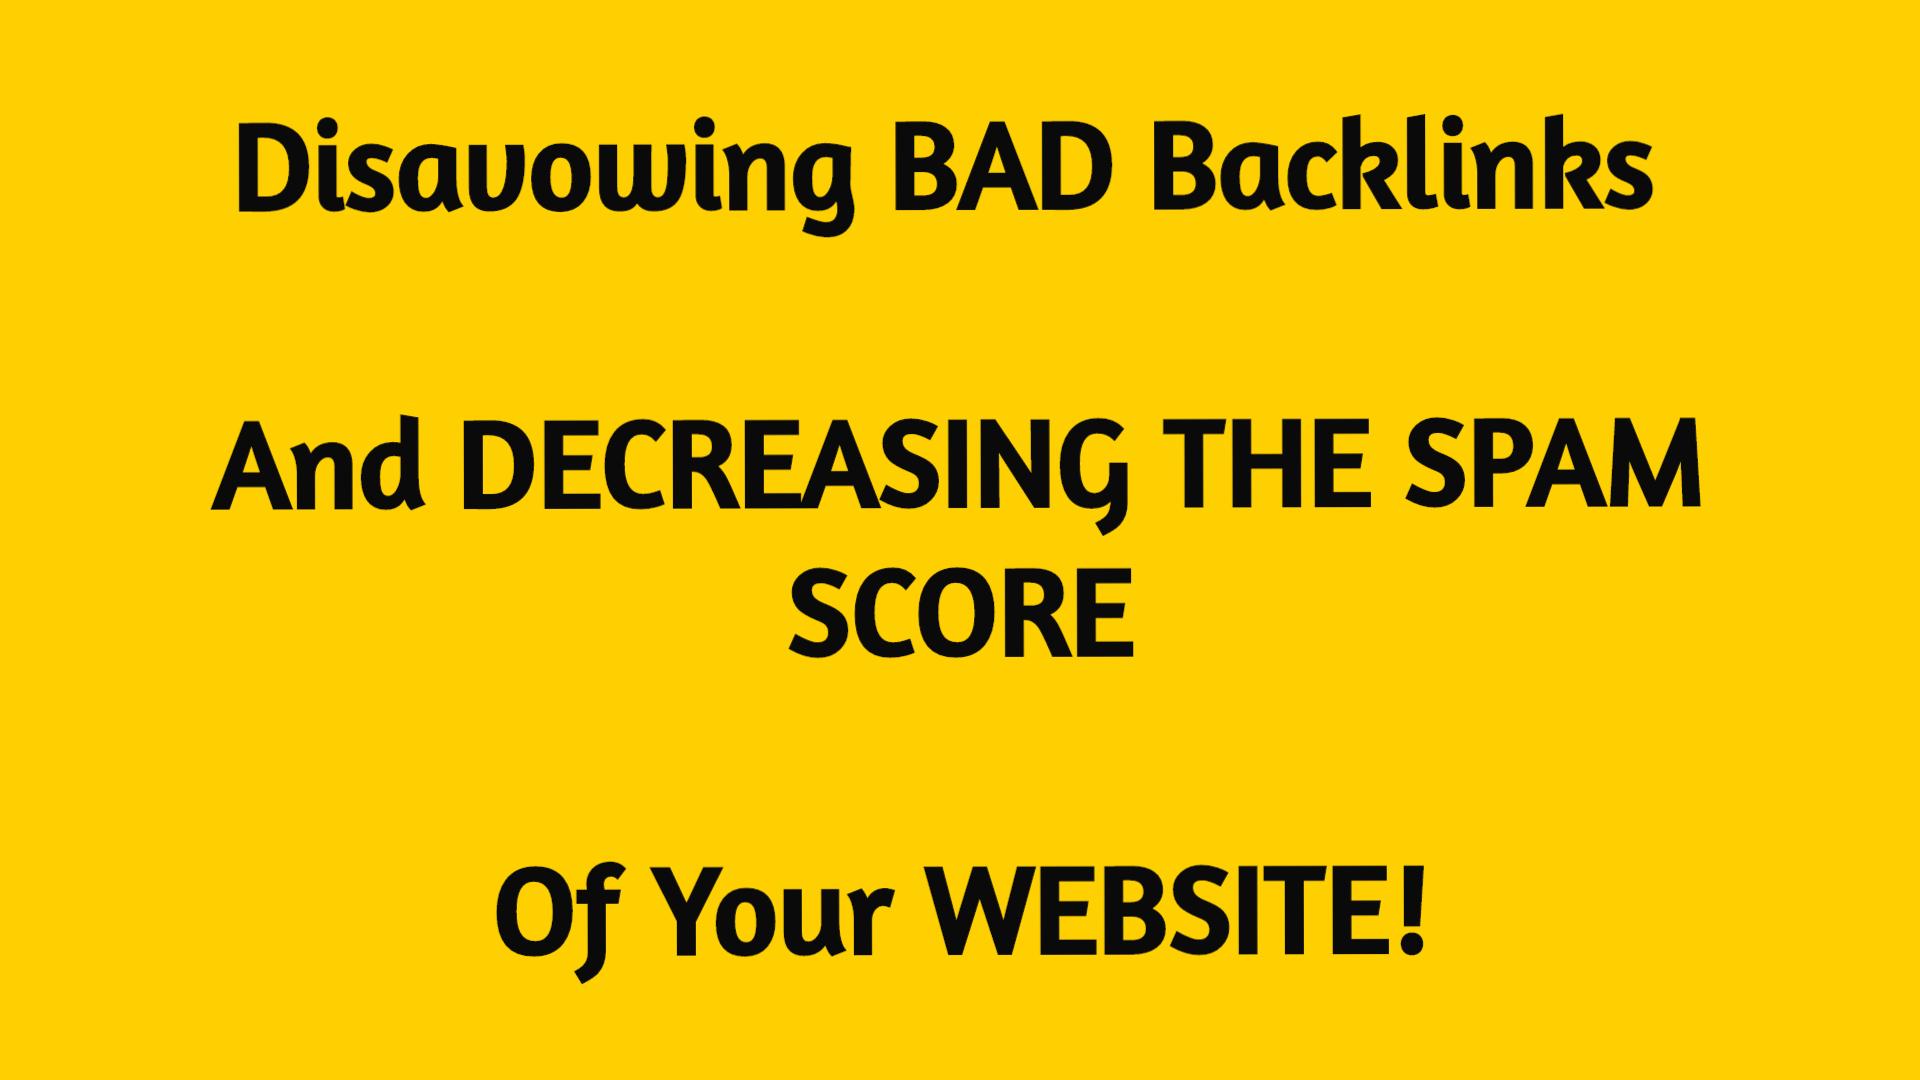 Removing BAD Backlinks & Decreasing SPAM Score Of Your Website